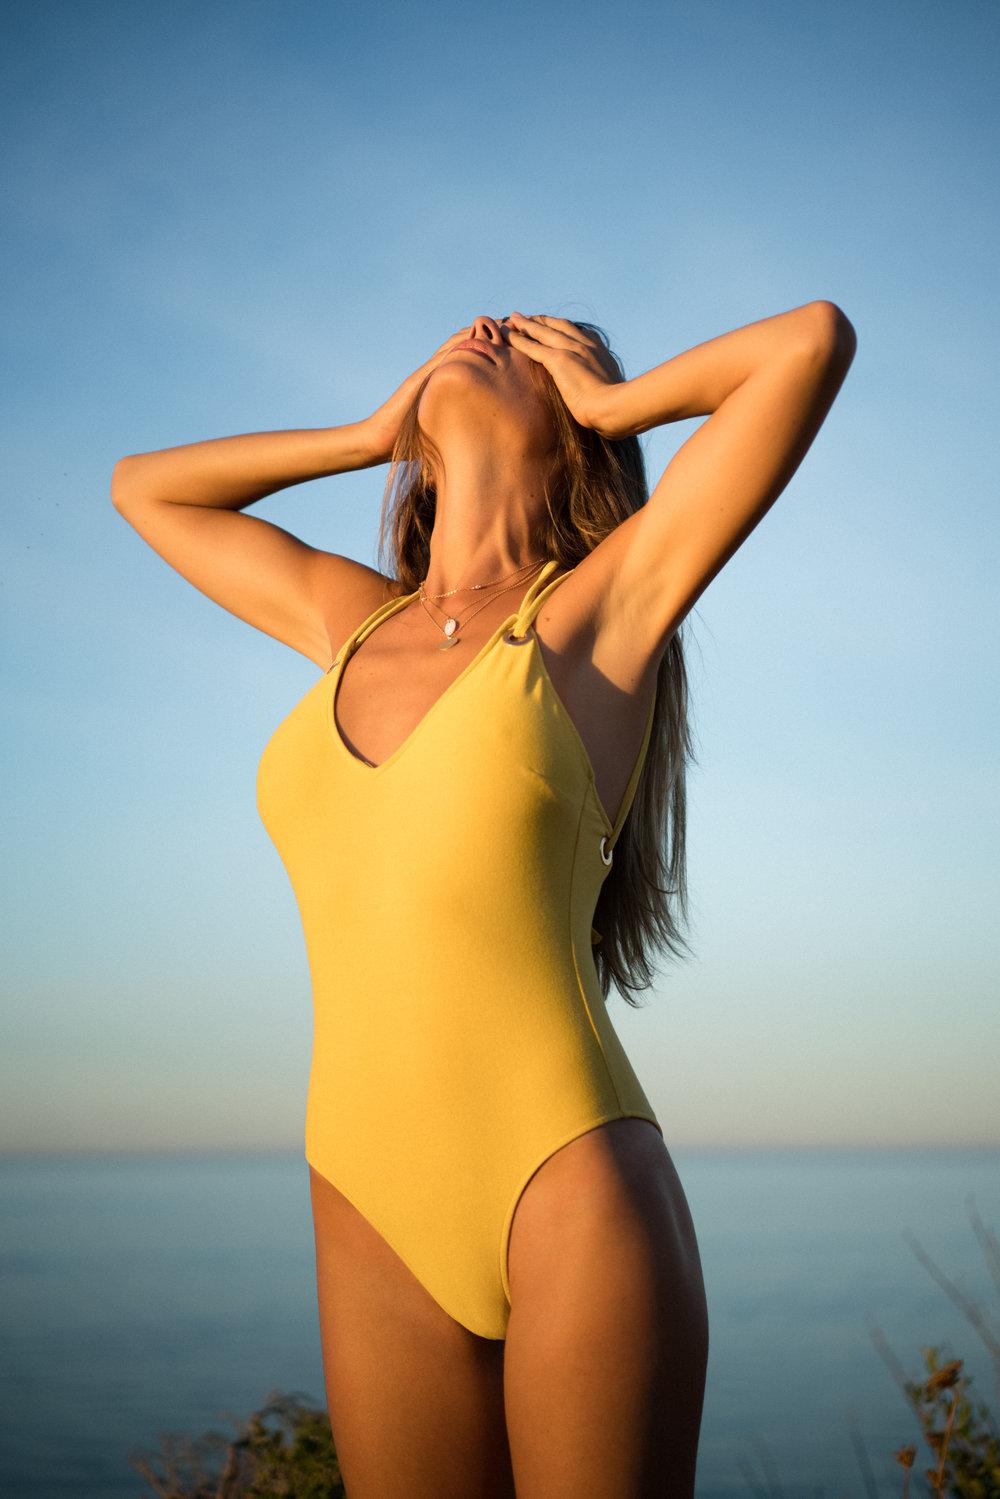 #clairesabattie #photographe #fashion #mode #beach #model